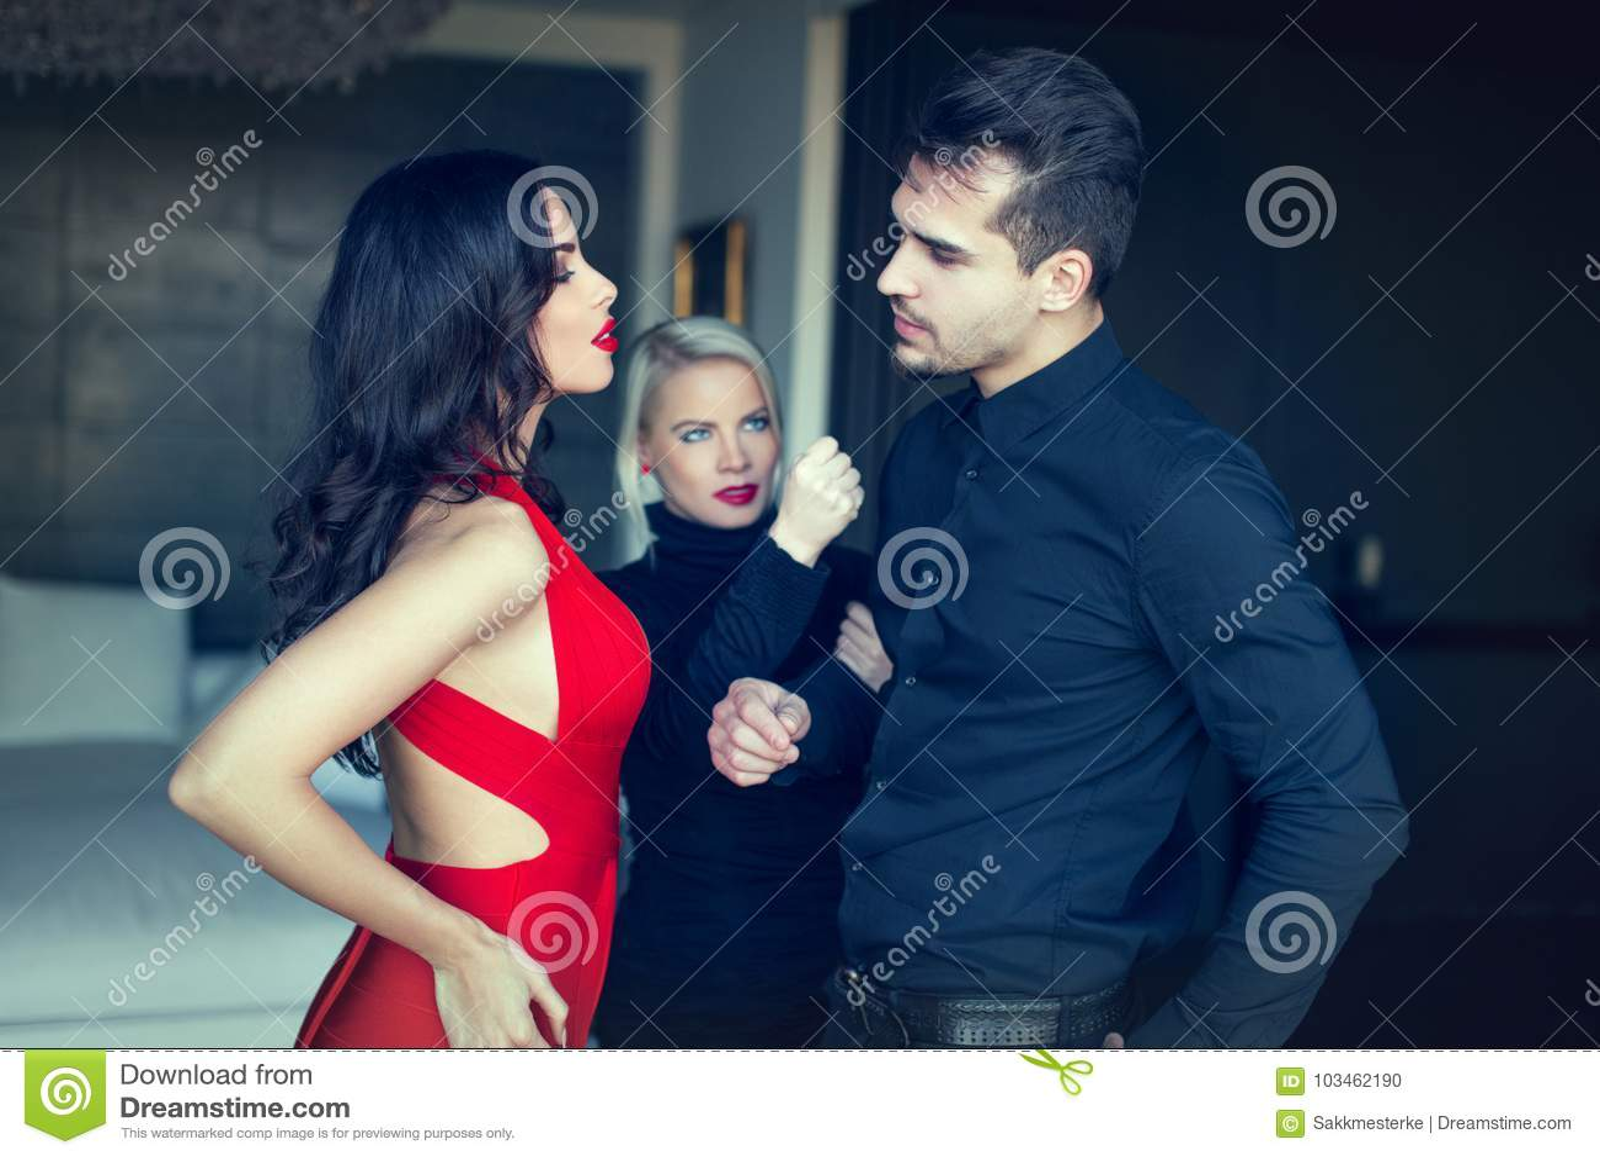 BF dating unaltra ragazza